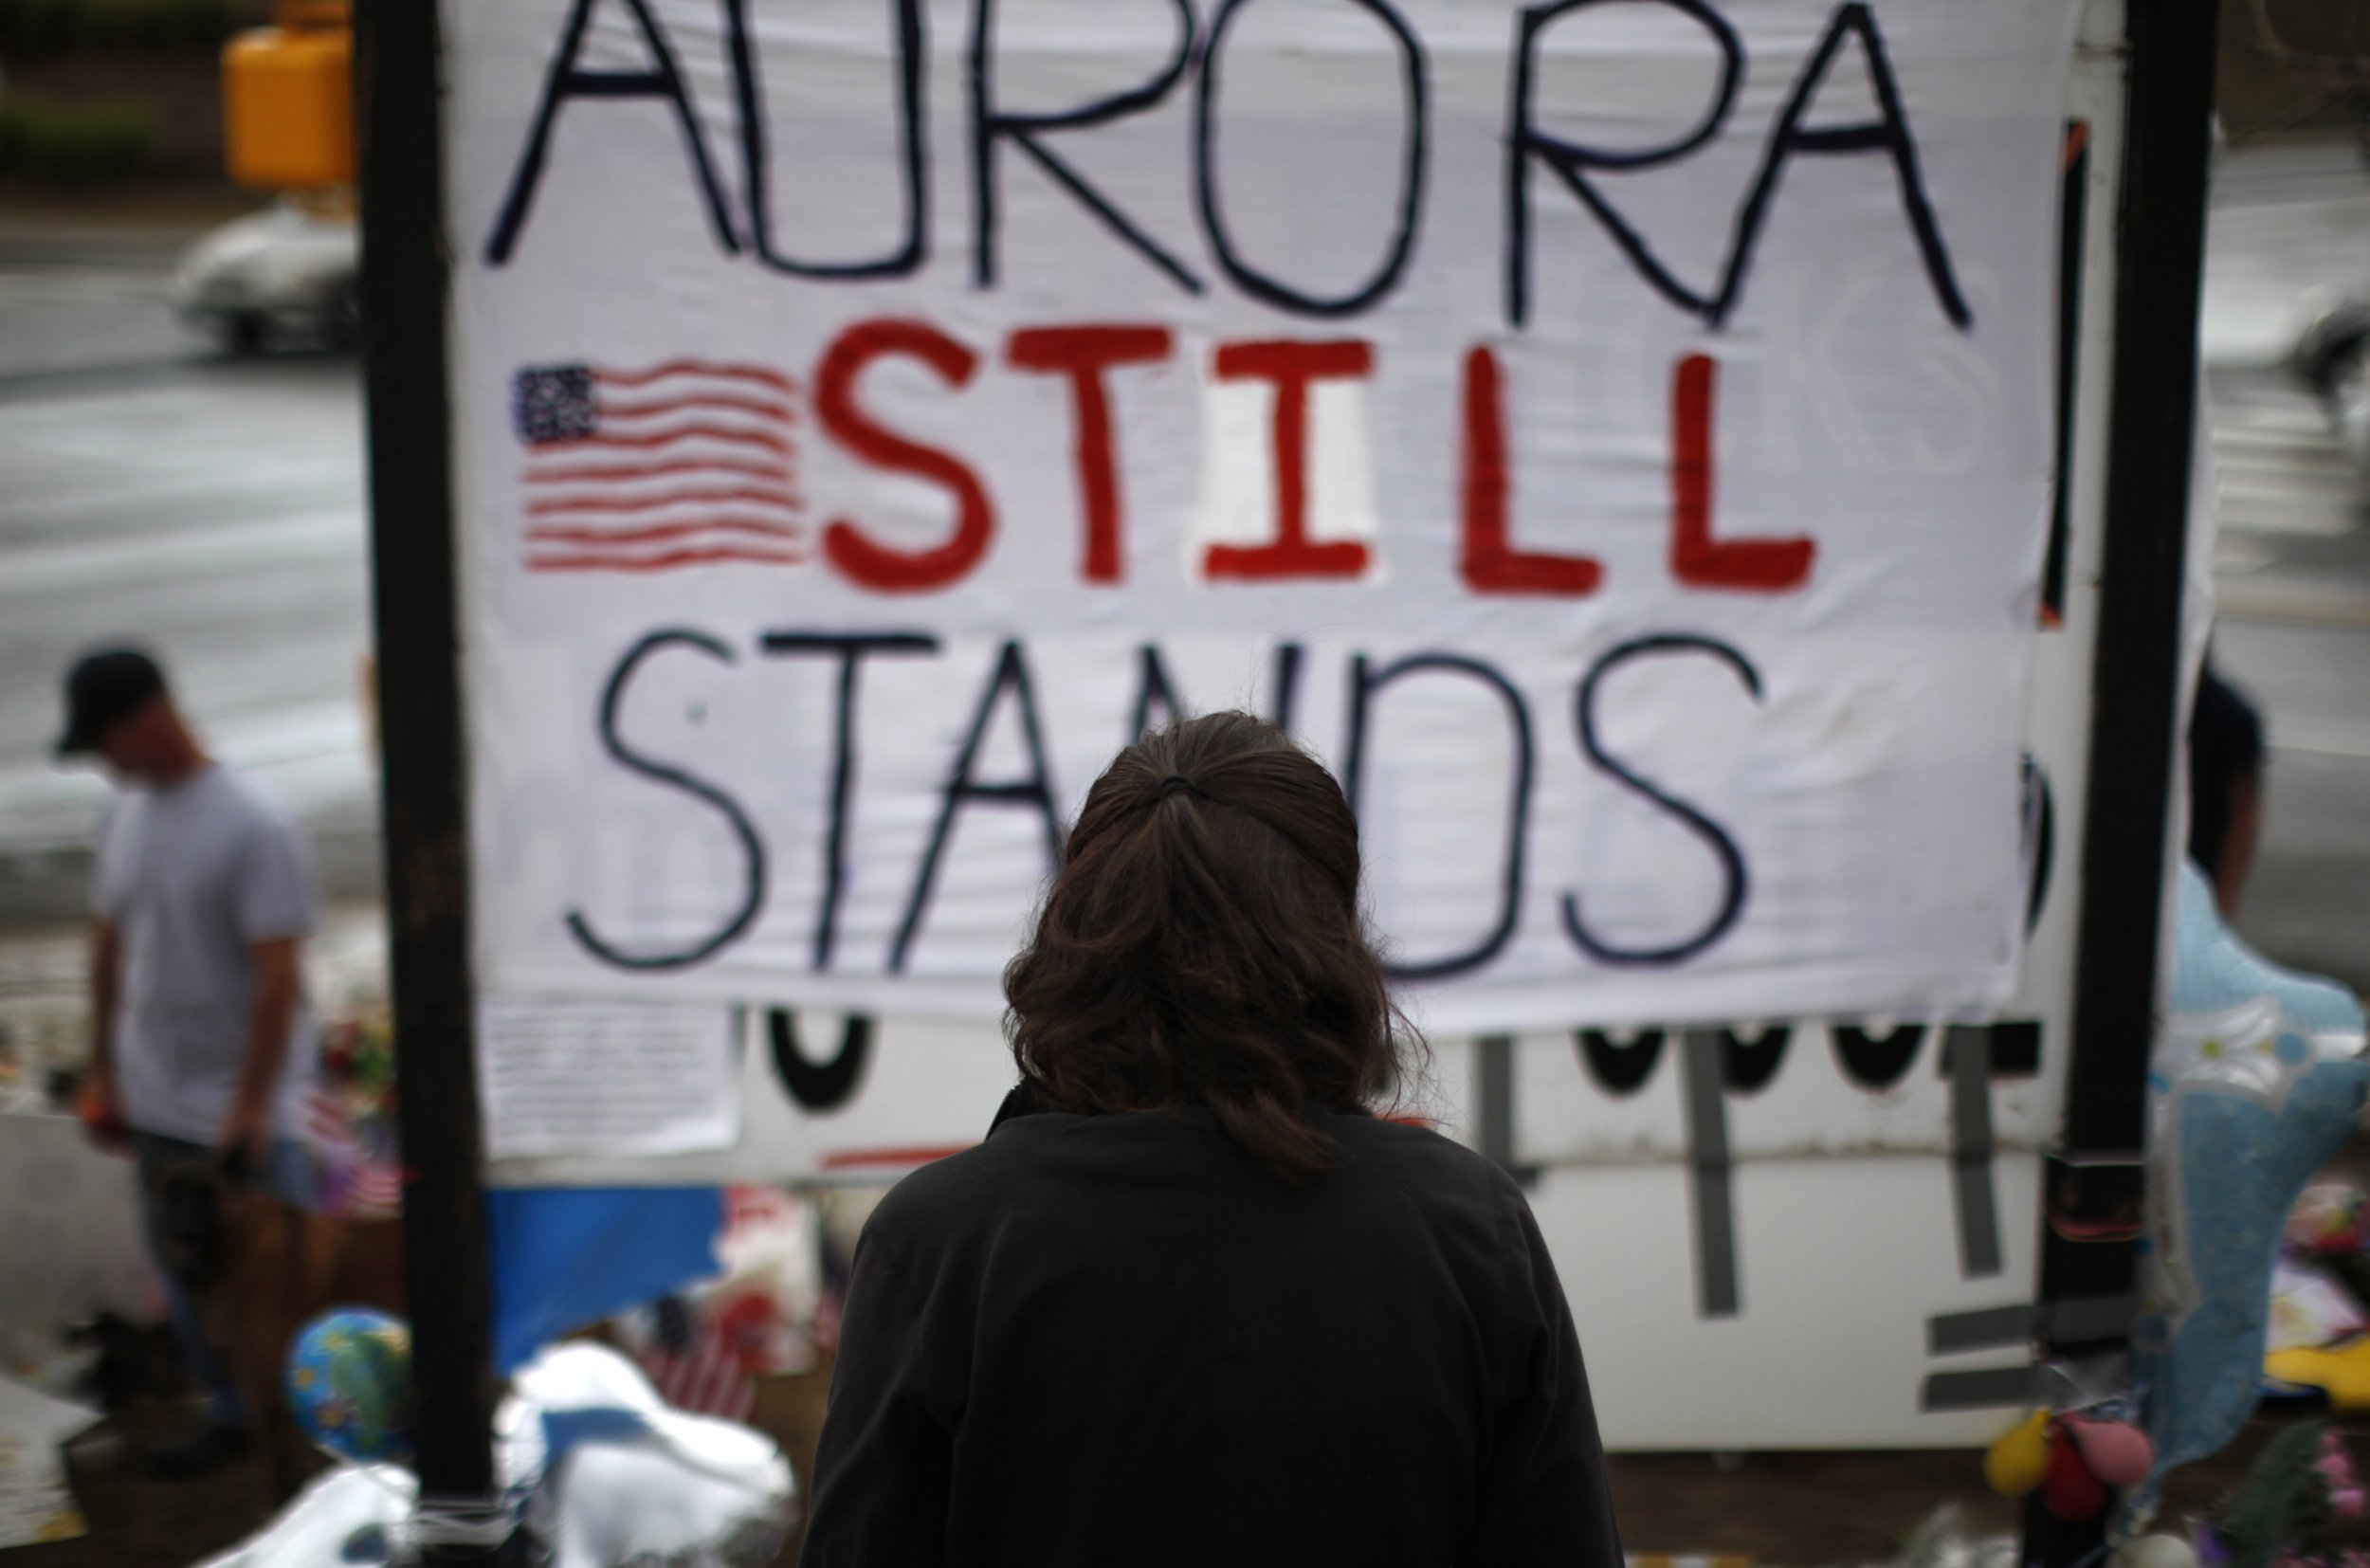 0719_Aurora_mass_shooting_01